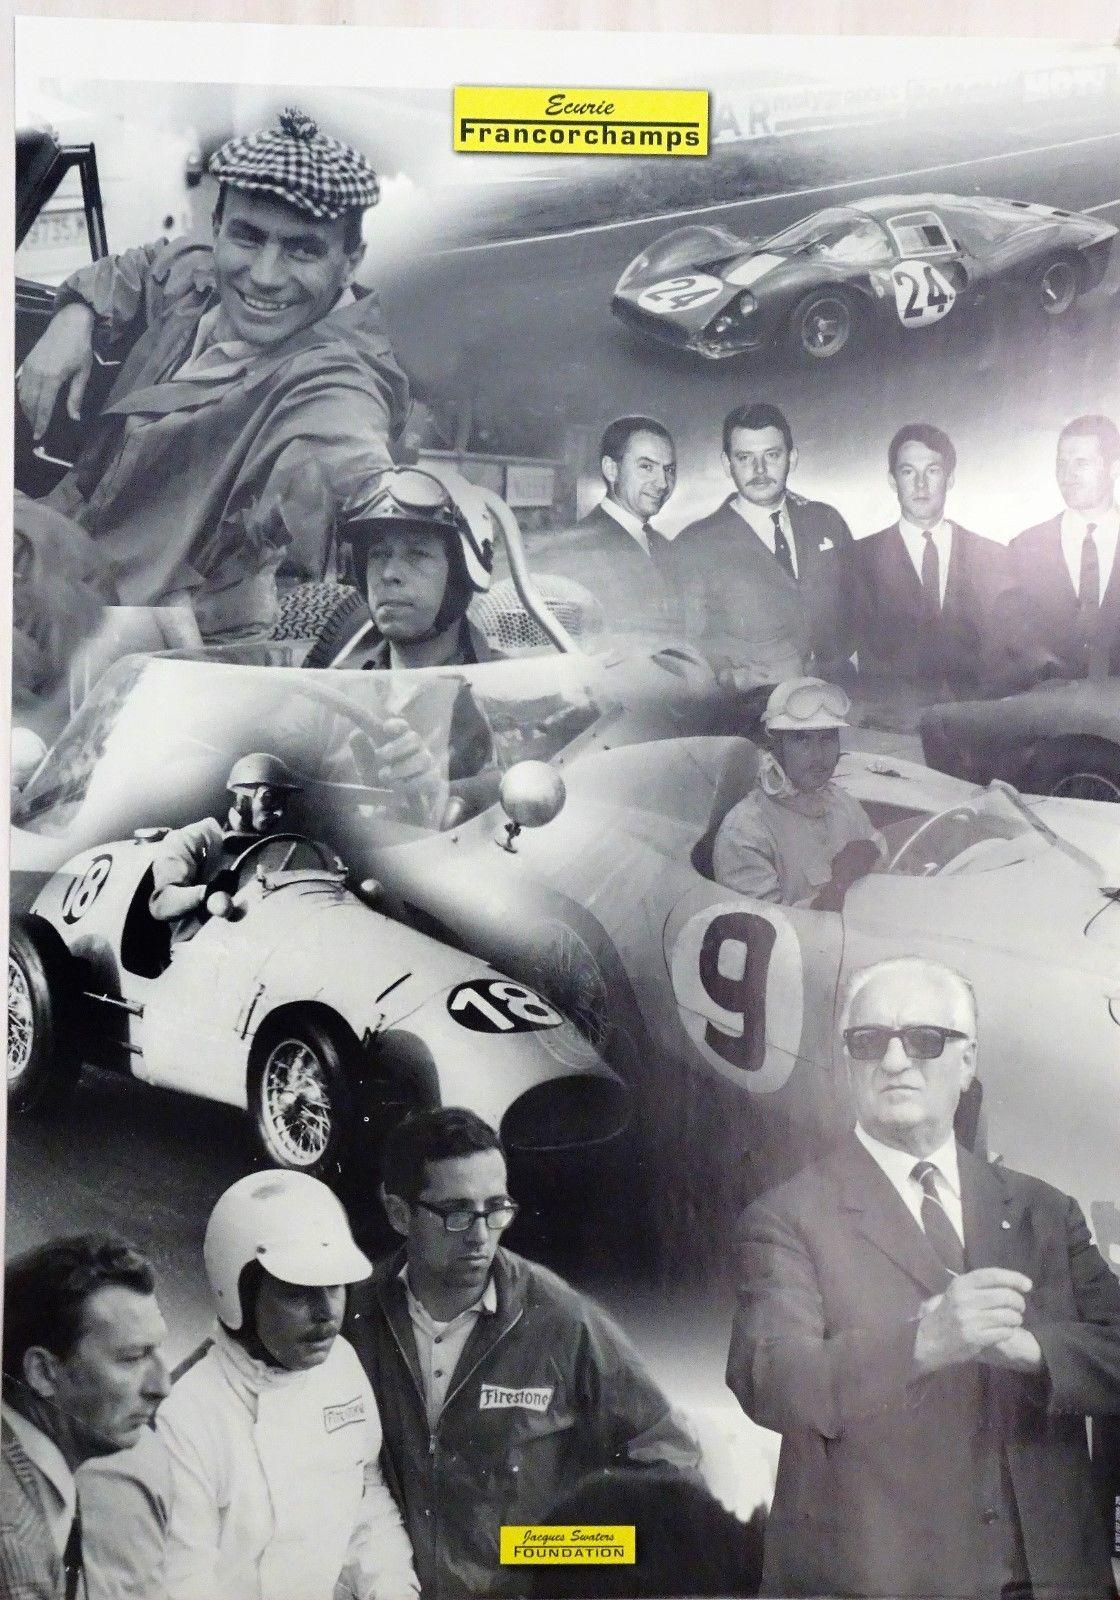 Ecurie Francorchamps Ferrari Poster 1